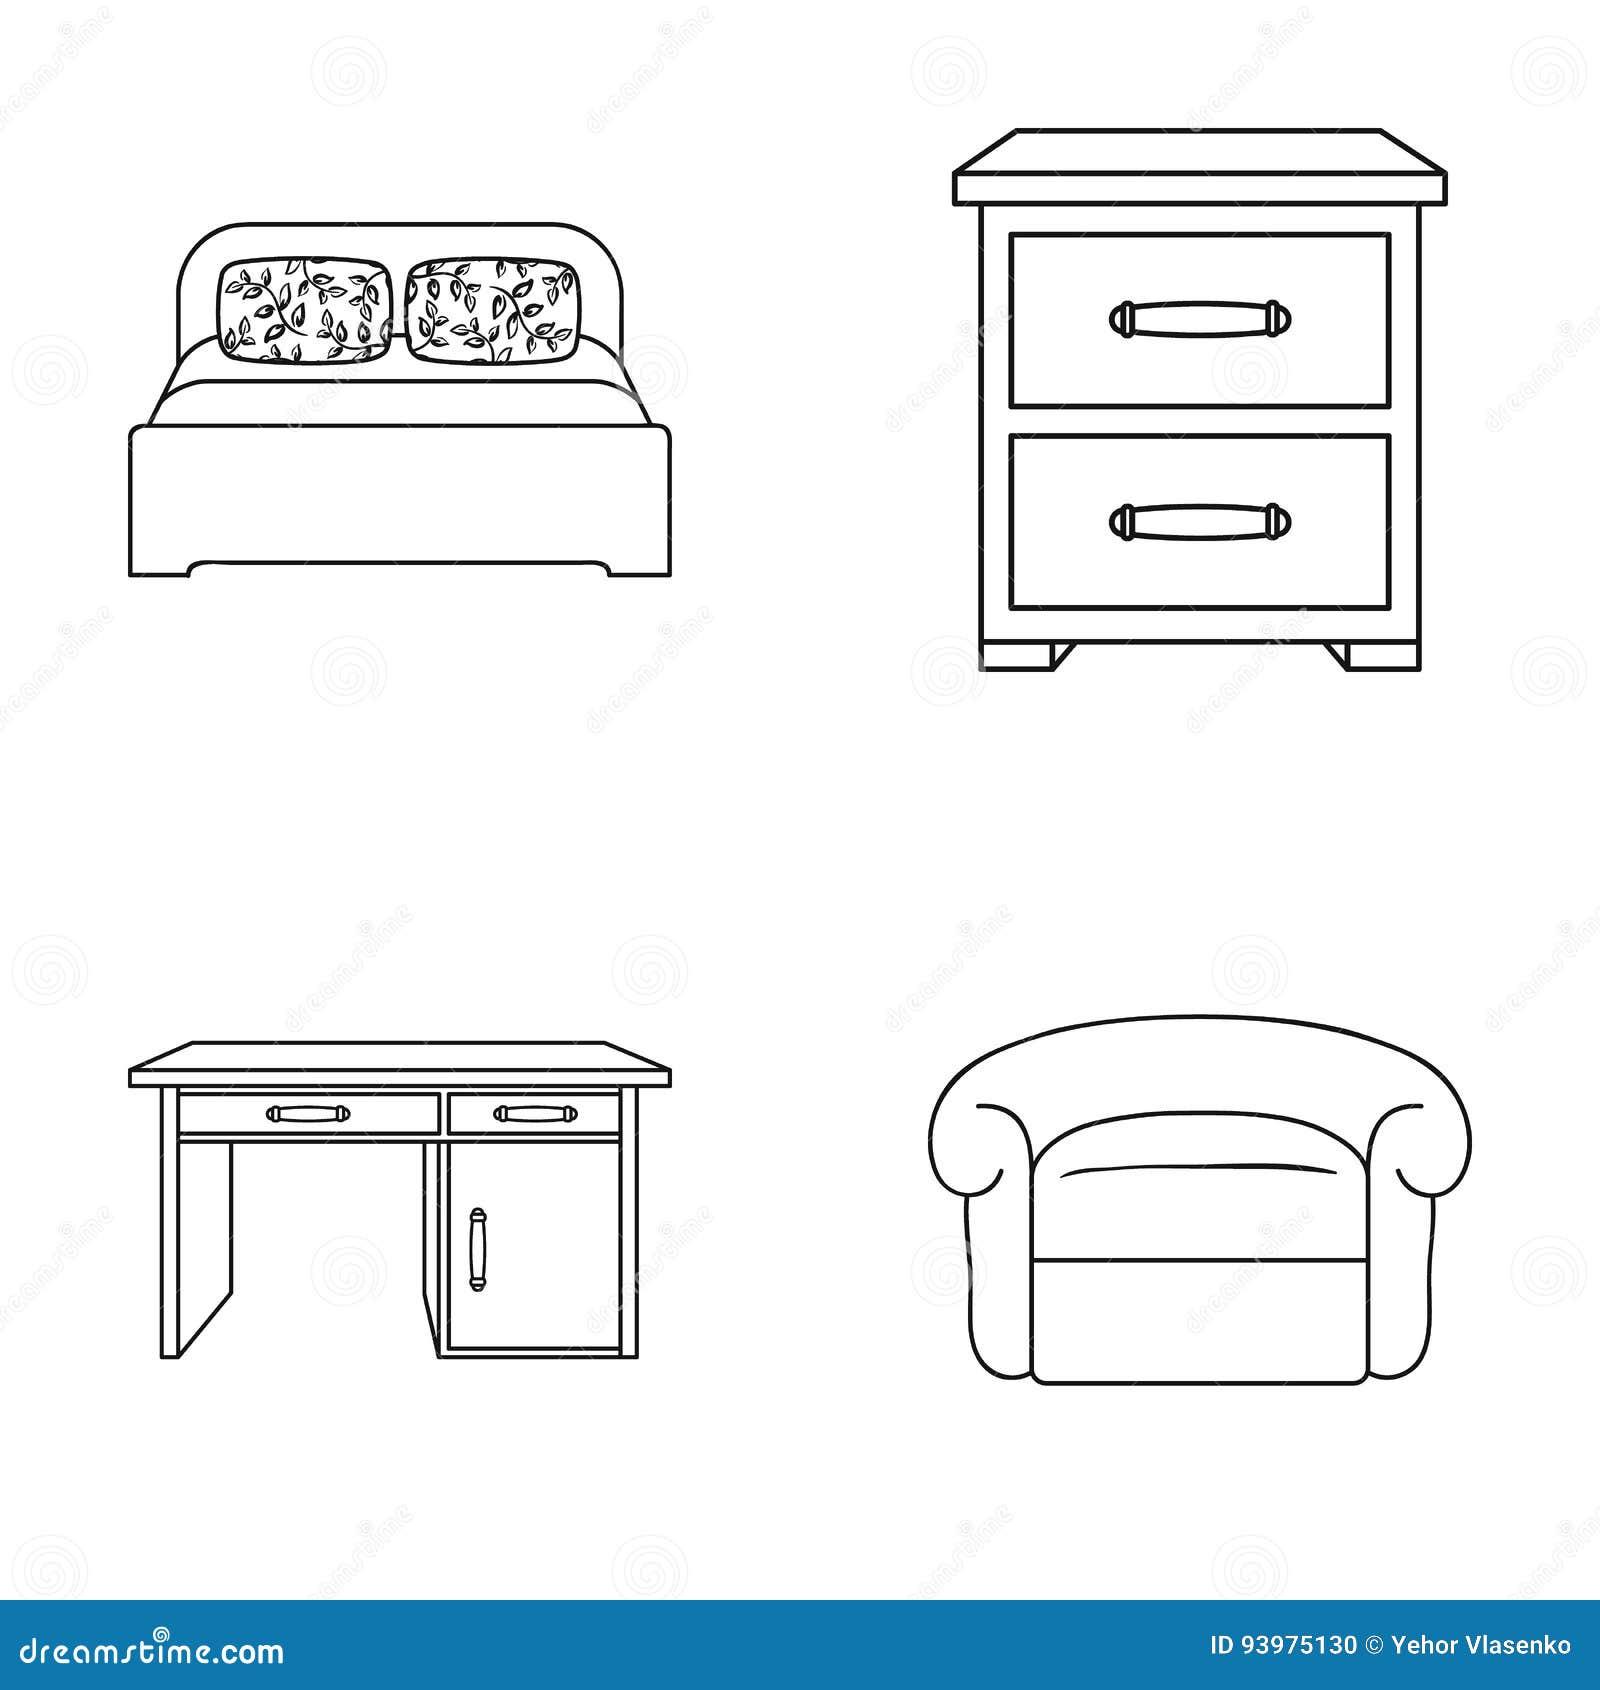 Bedroom Interior Design Set Furniture Vector ~ Interior design bed bedroom furniture and home